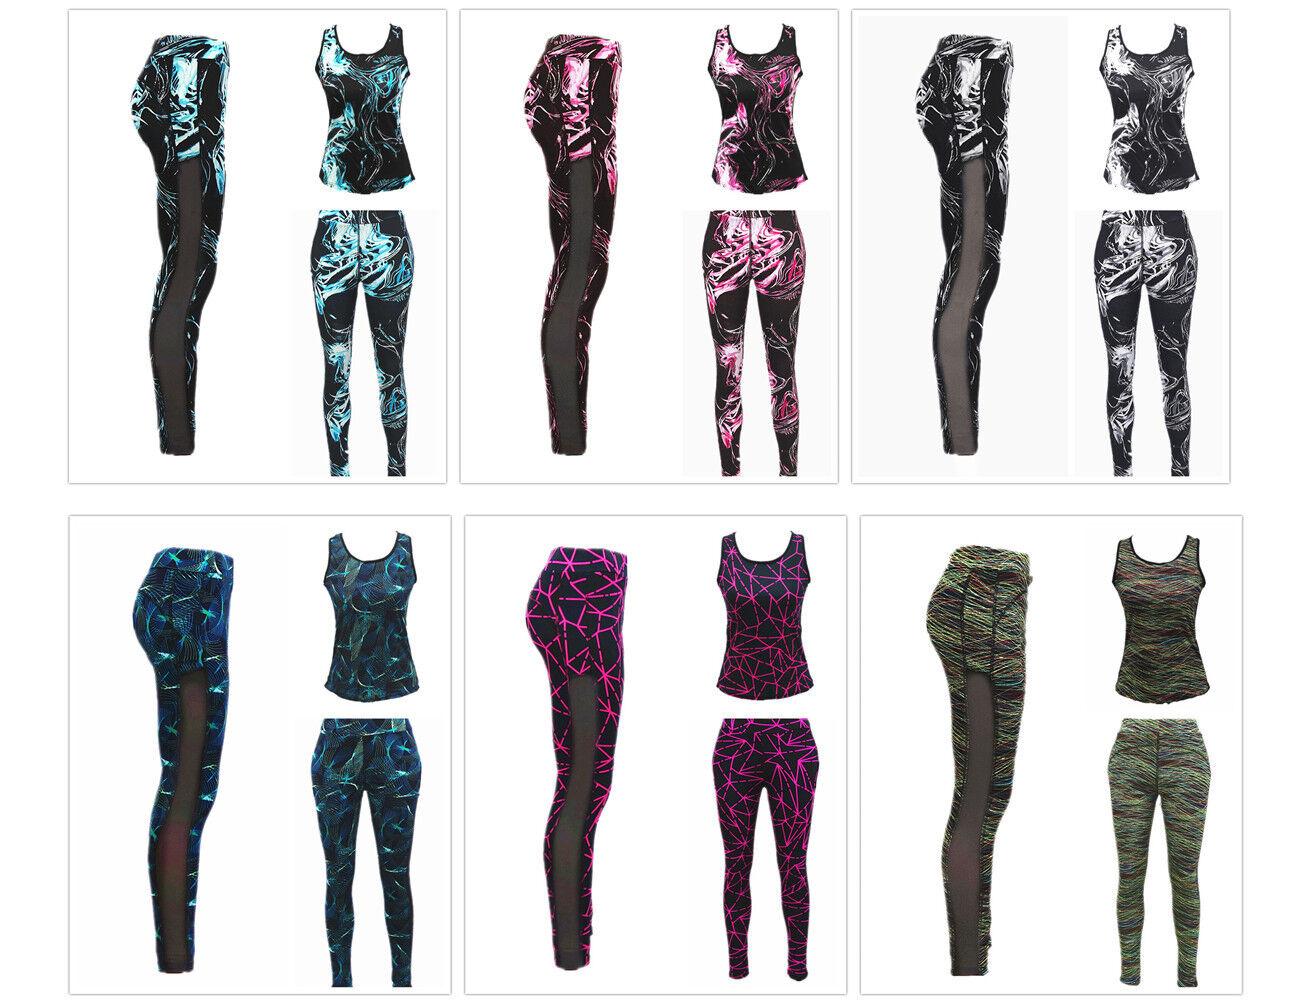 Damen Sport Wear Leggings Fitness Hose + Top Set Gym Yoga Tights S - XL